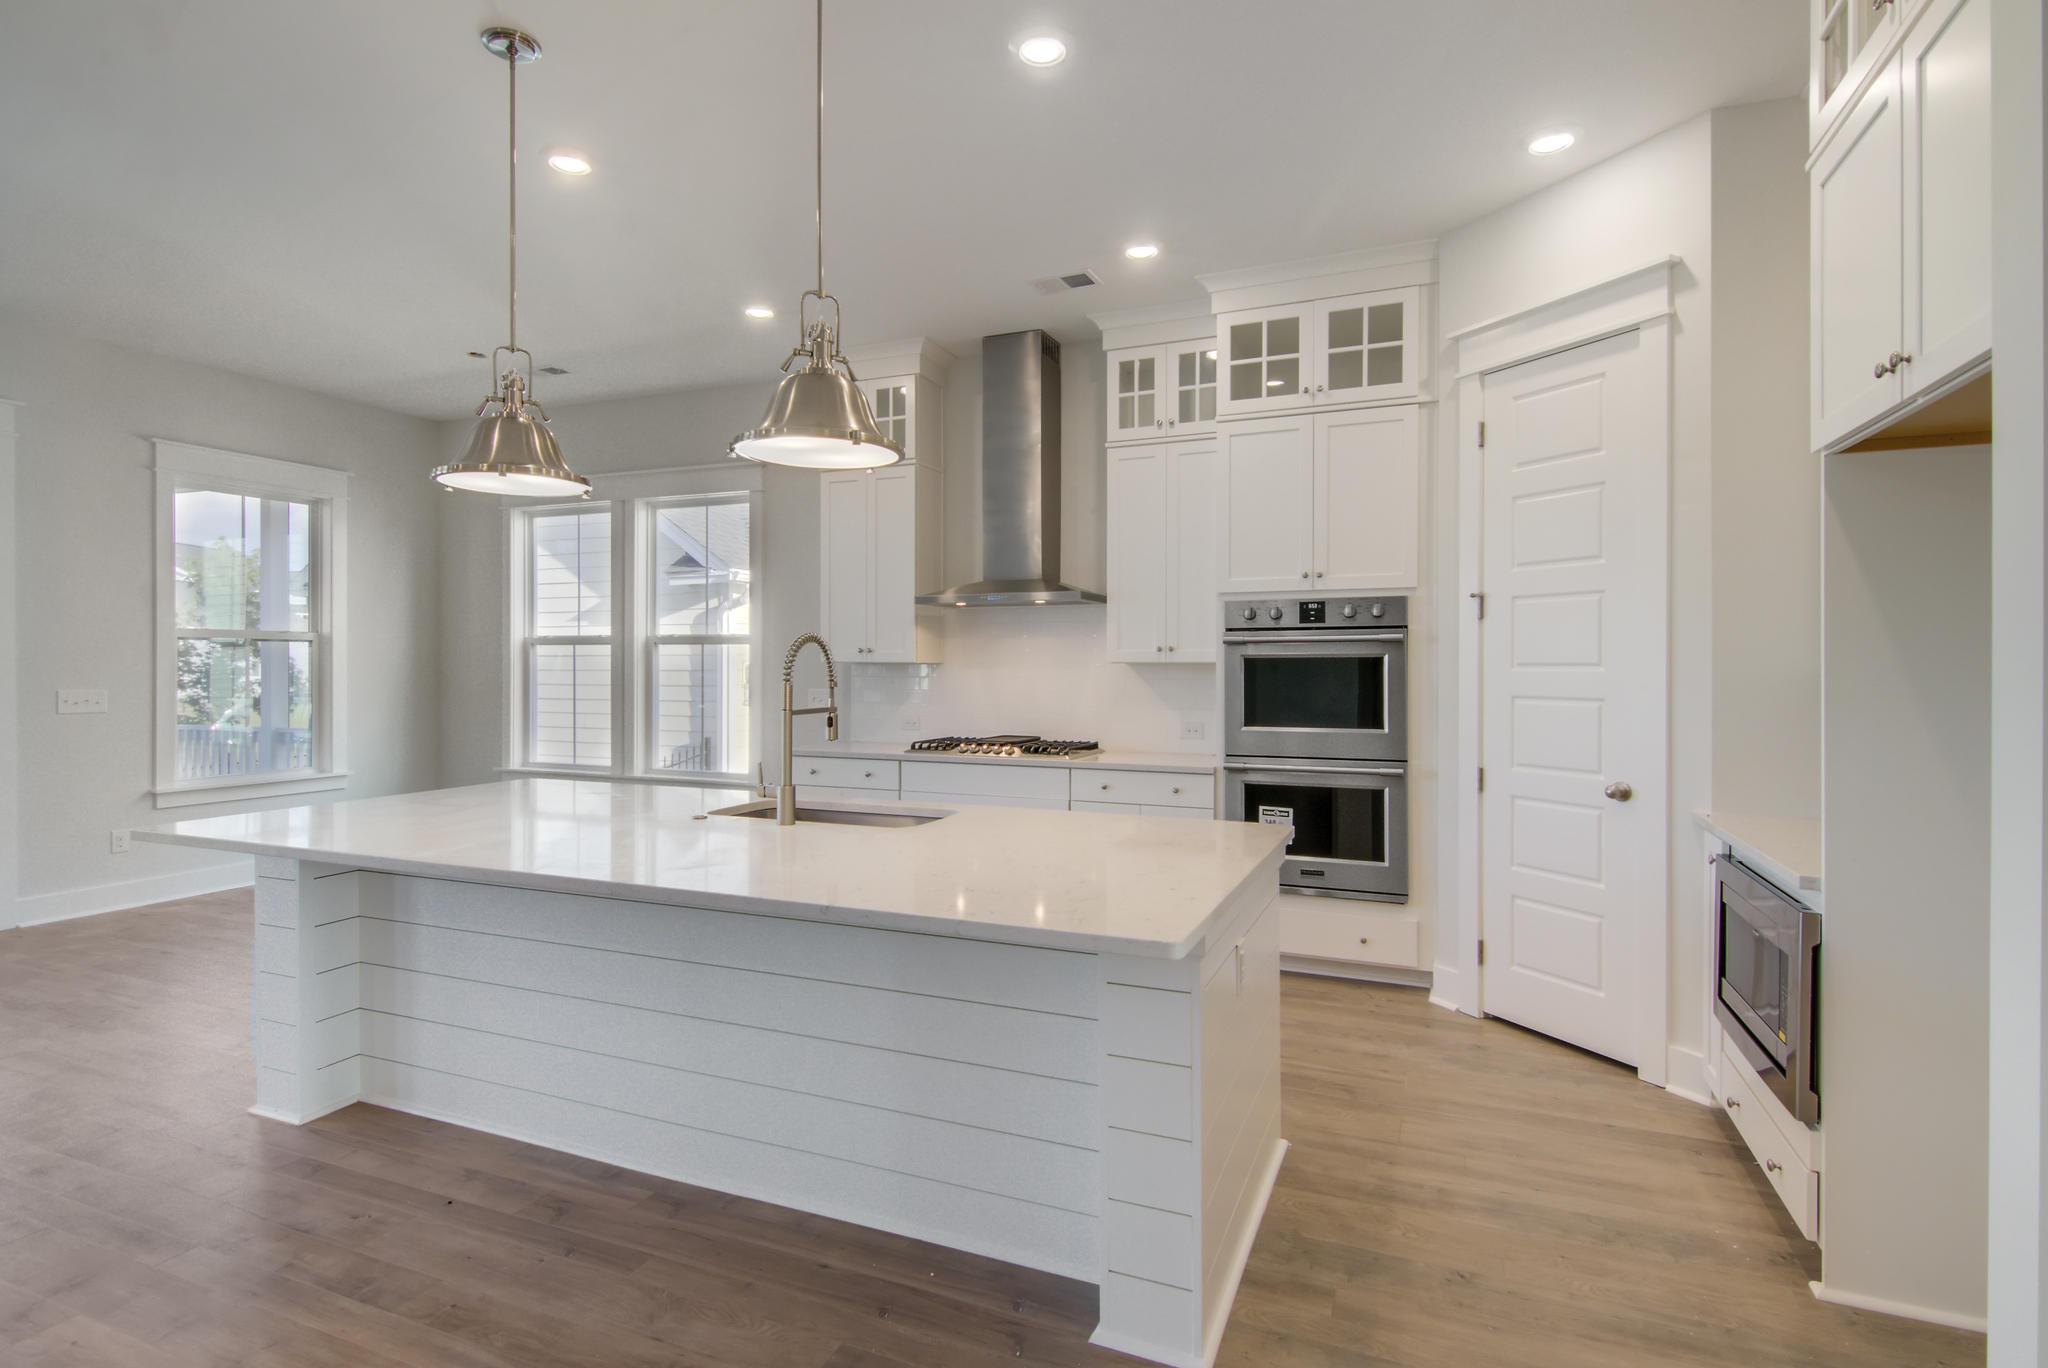 Carolina Park Homes For Sale - 1734 Sandy Brook, Mount Pleasant, SC - 12